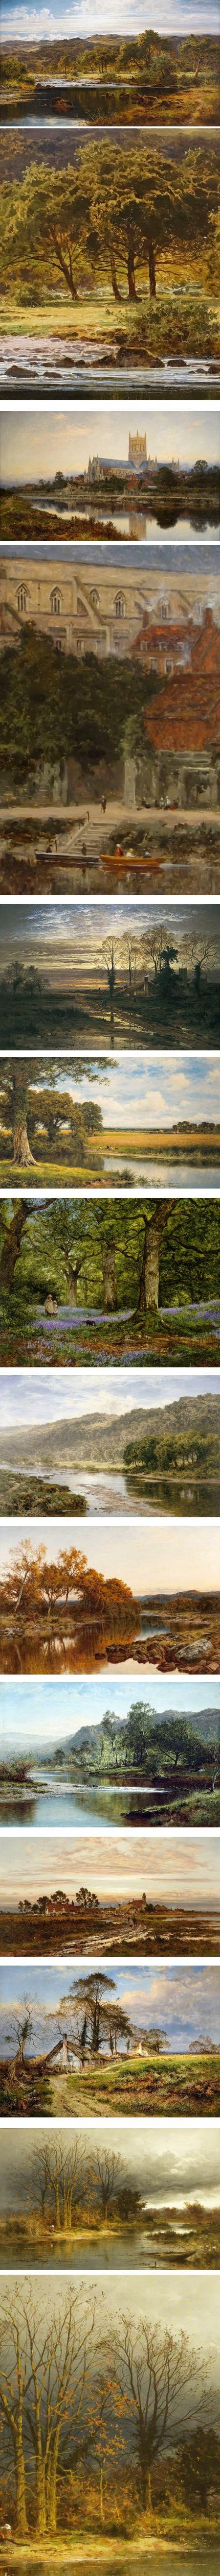 Benjamin Williams Leader, English landscape painter